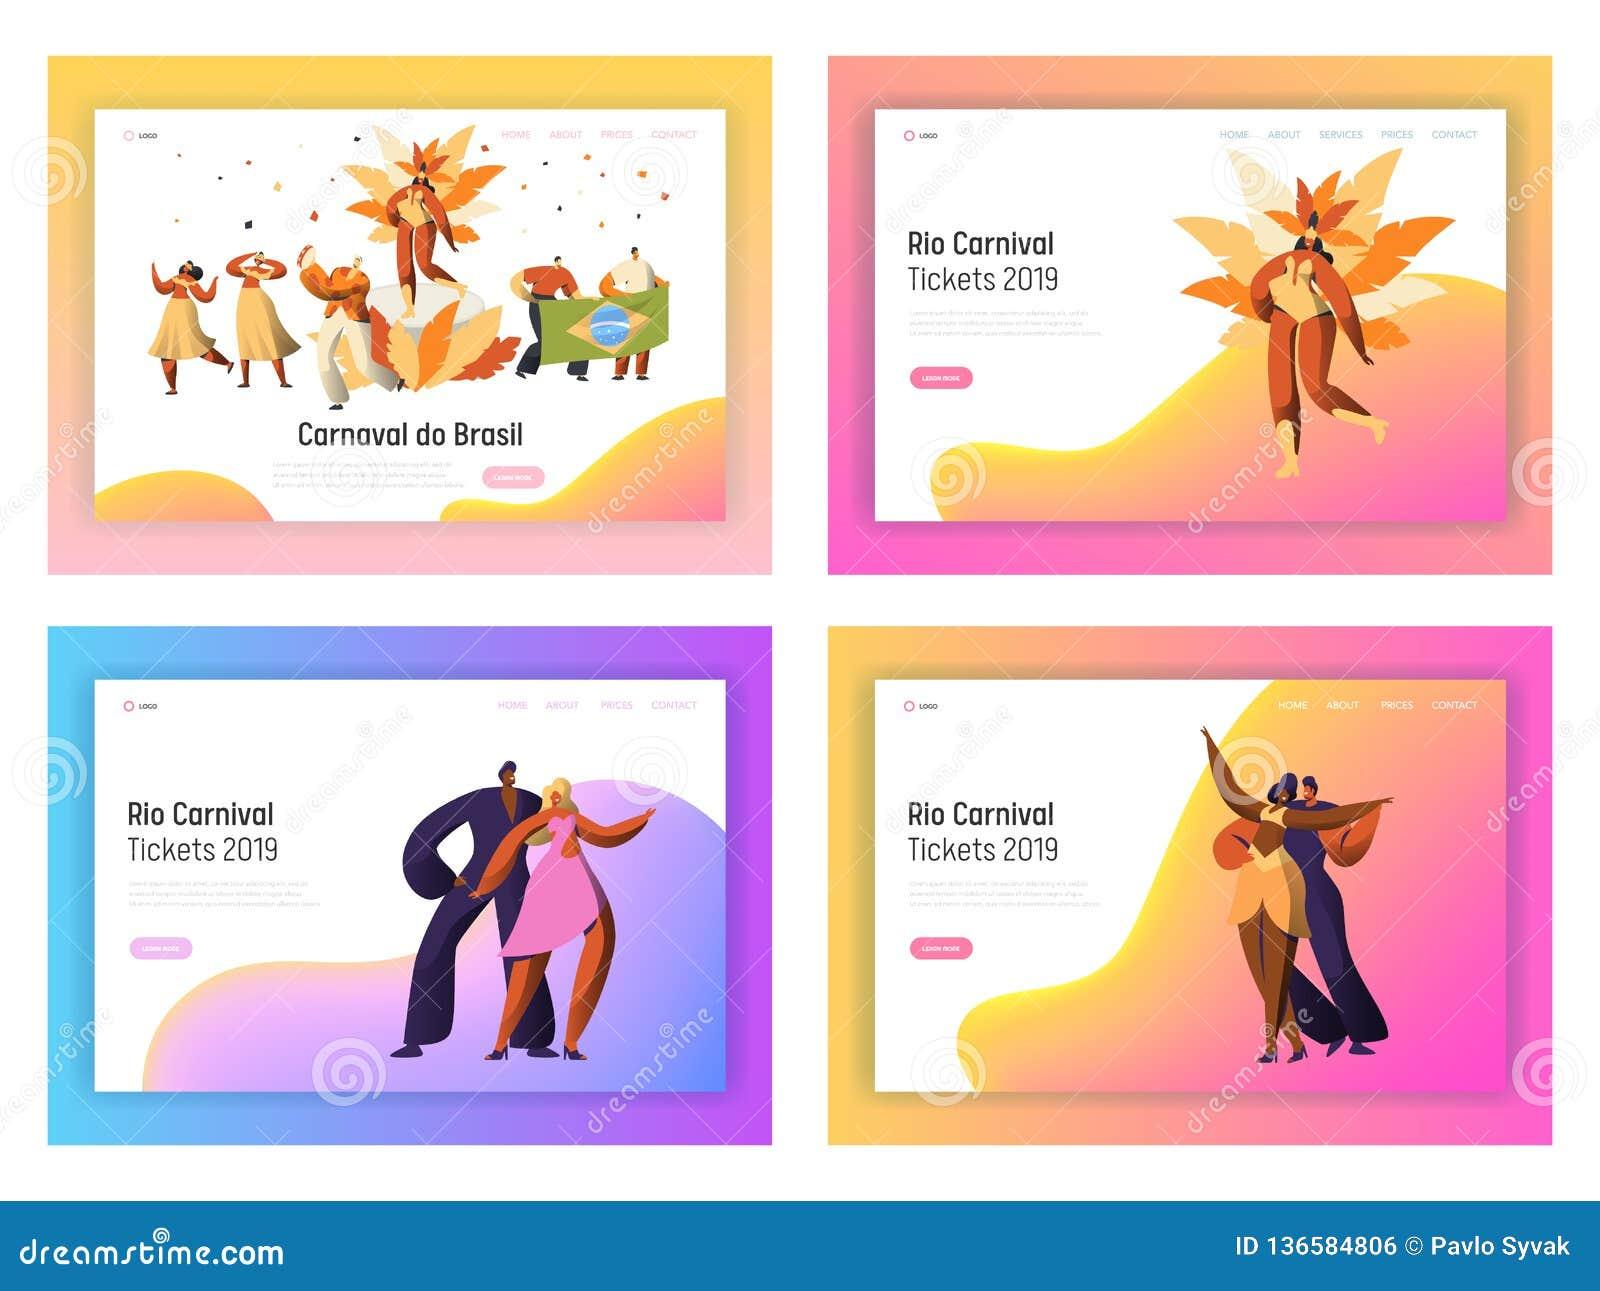 785f99e80323 Sistema De Samba Dancer Character Landing Page Del Carnaval Del ...